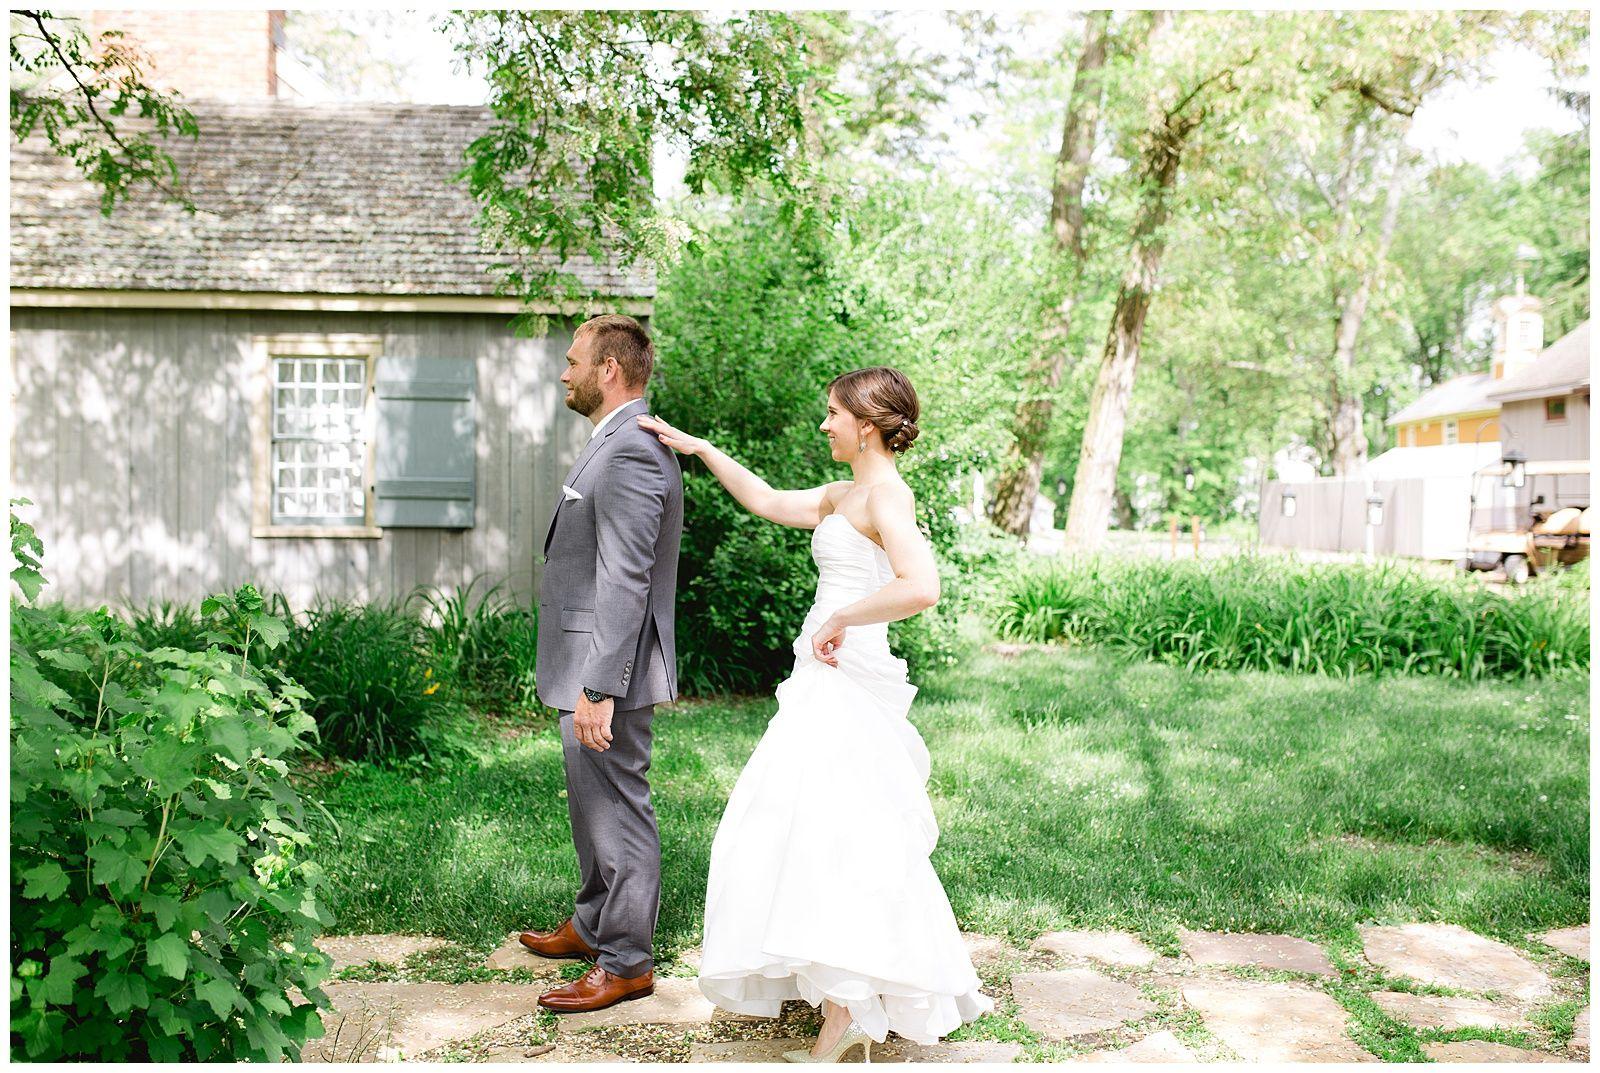 Allison and Karl Wedding, Waterloo Village, Stanhope, New